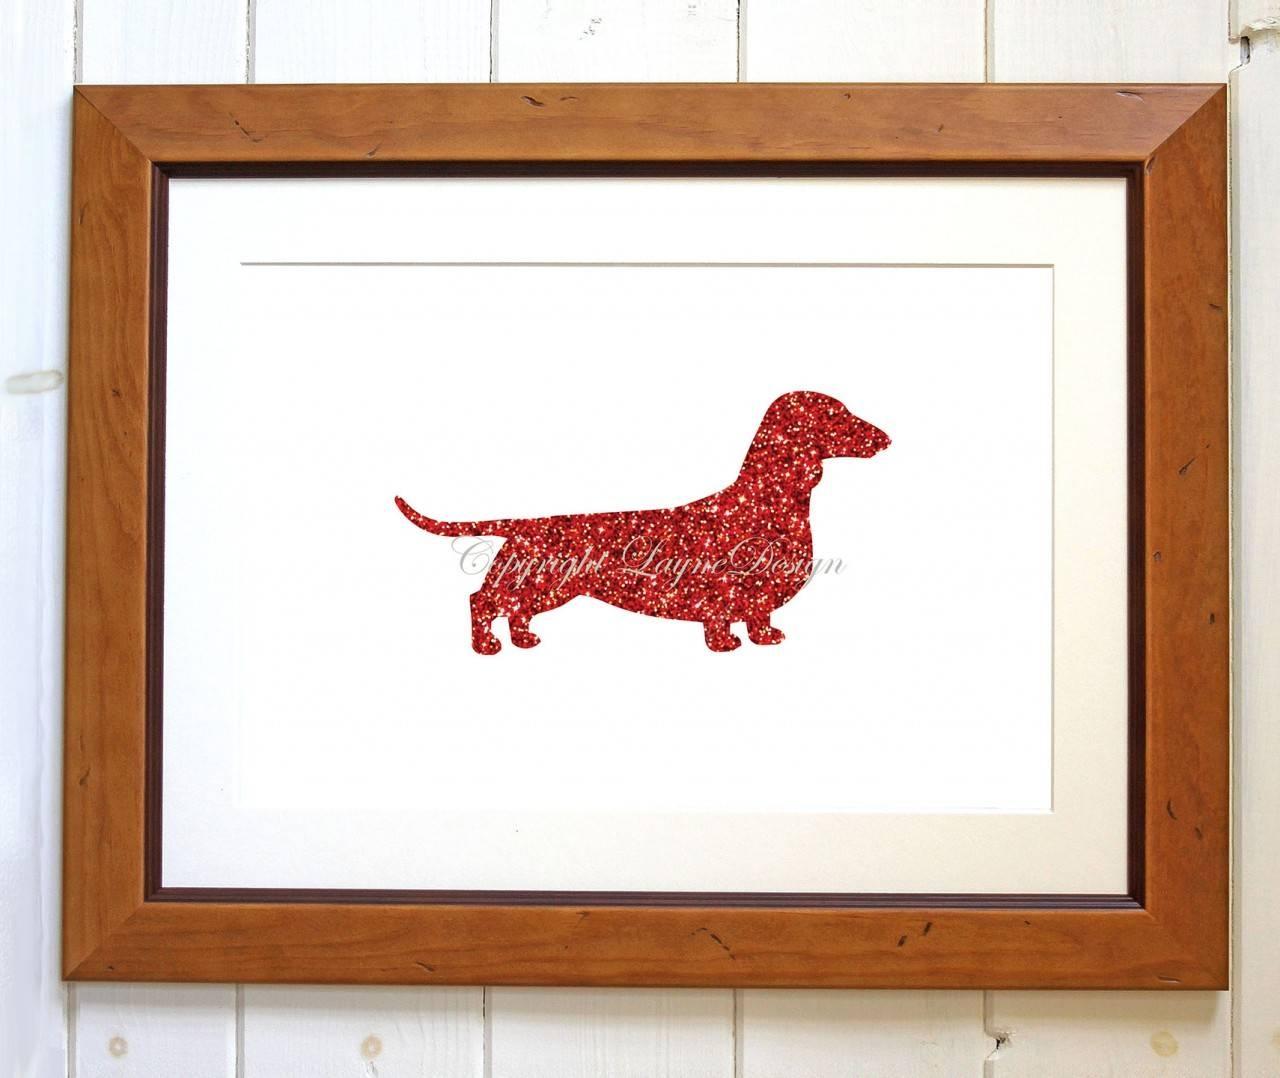 Red Glitter Dachshund Instant Download Art Print Wall Art In 2017 Dachshund Wall Art (View 3 of 22)